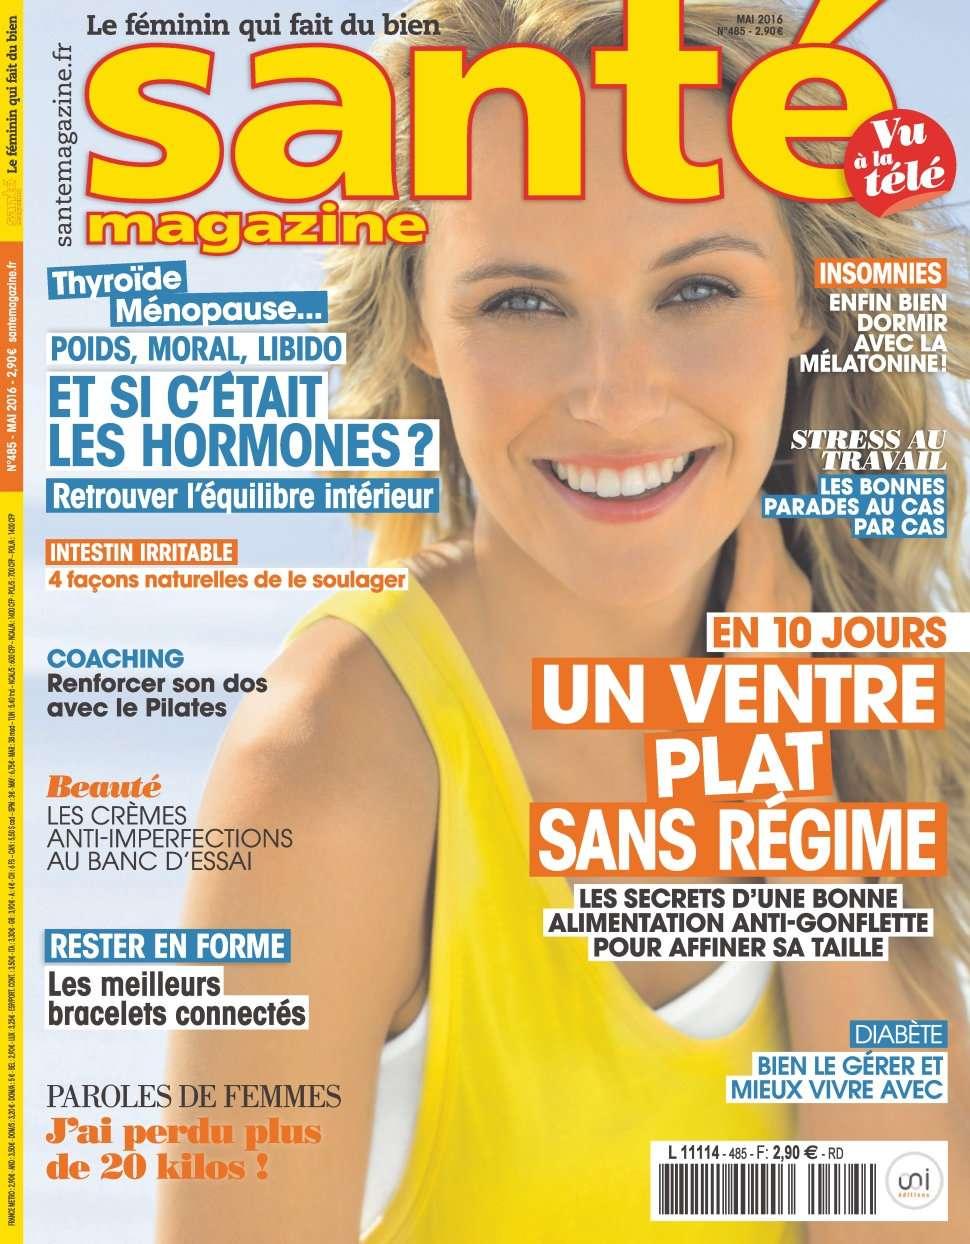 Santé magazine 485 - Mai 2016